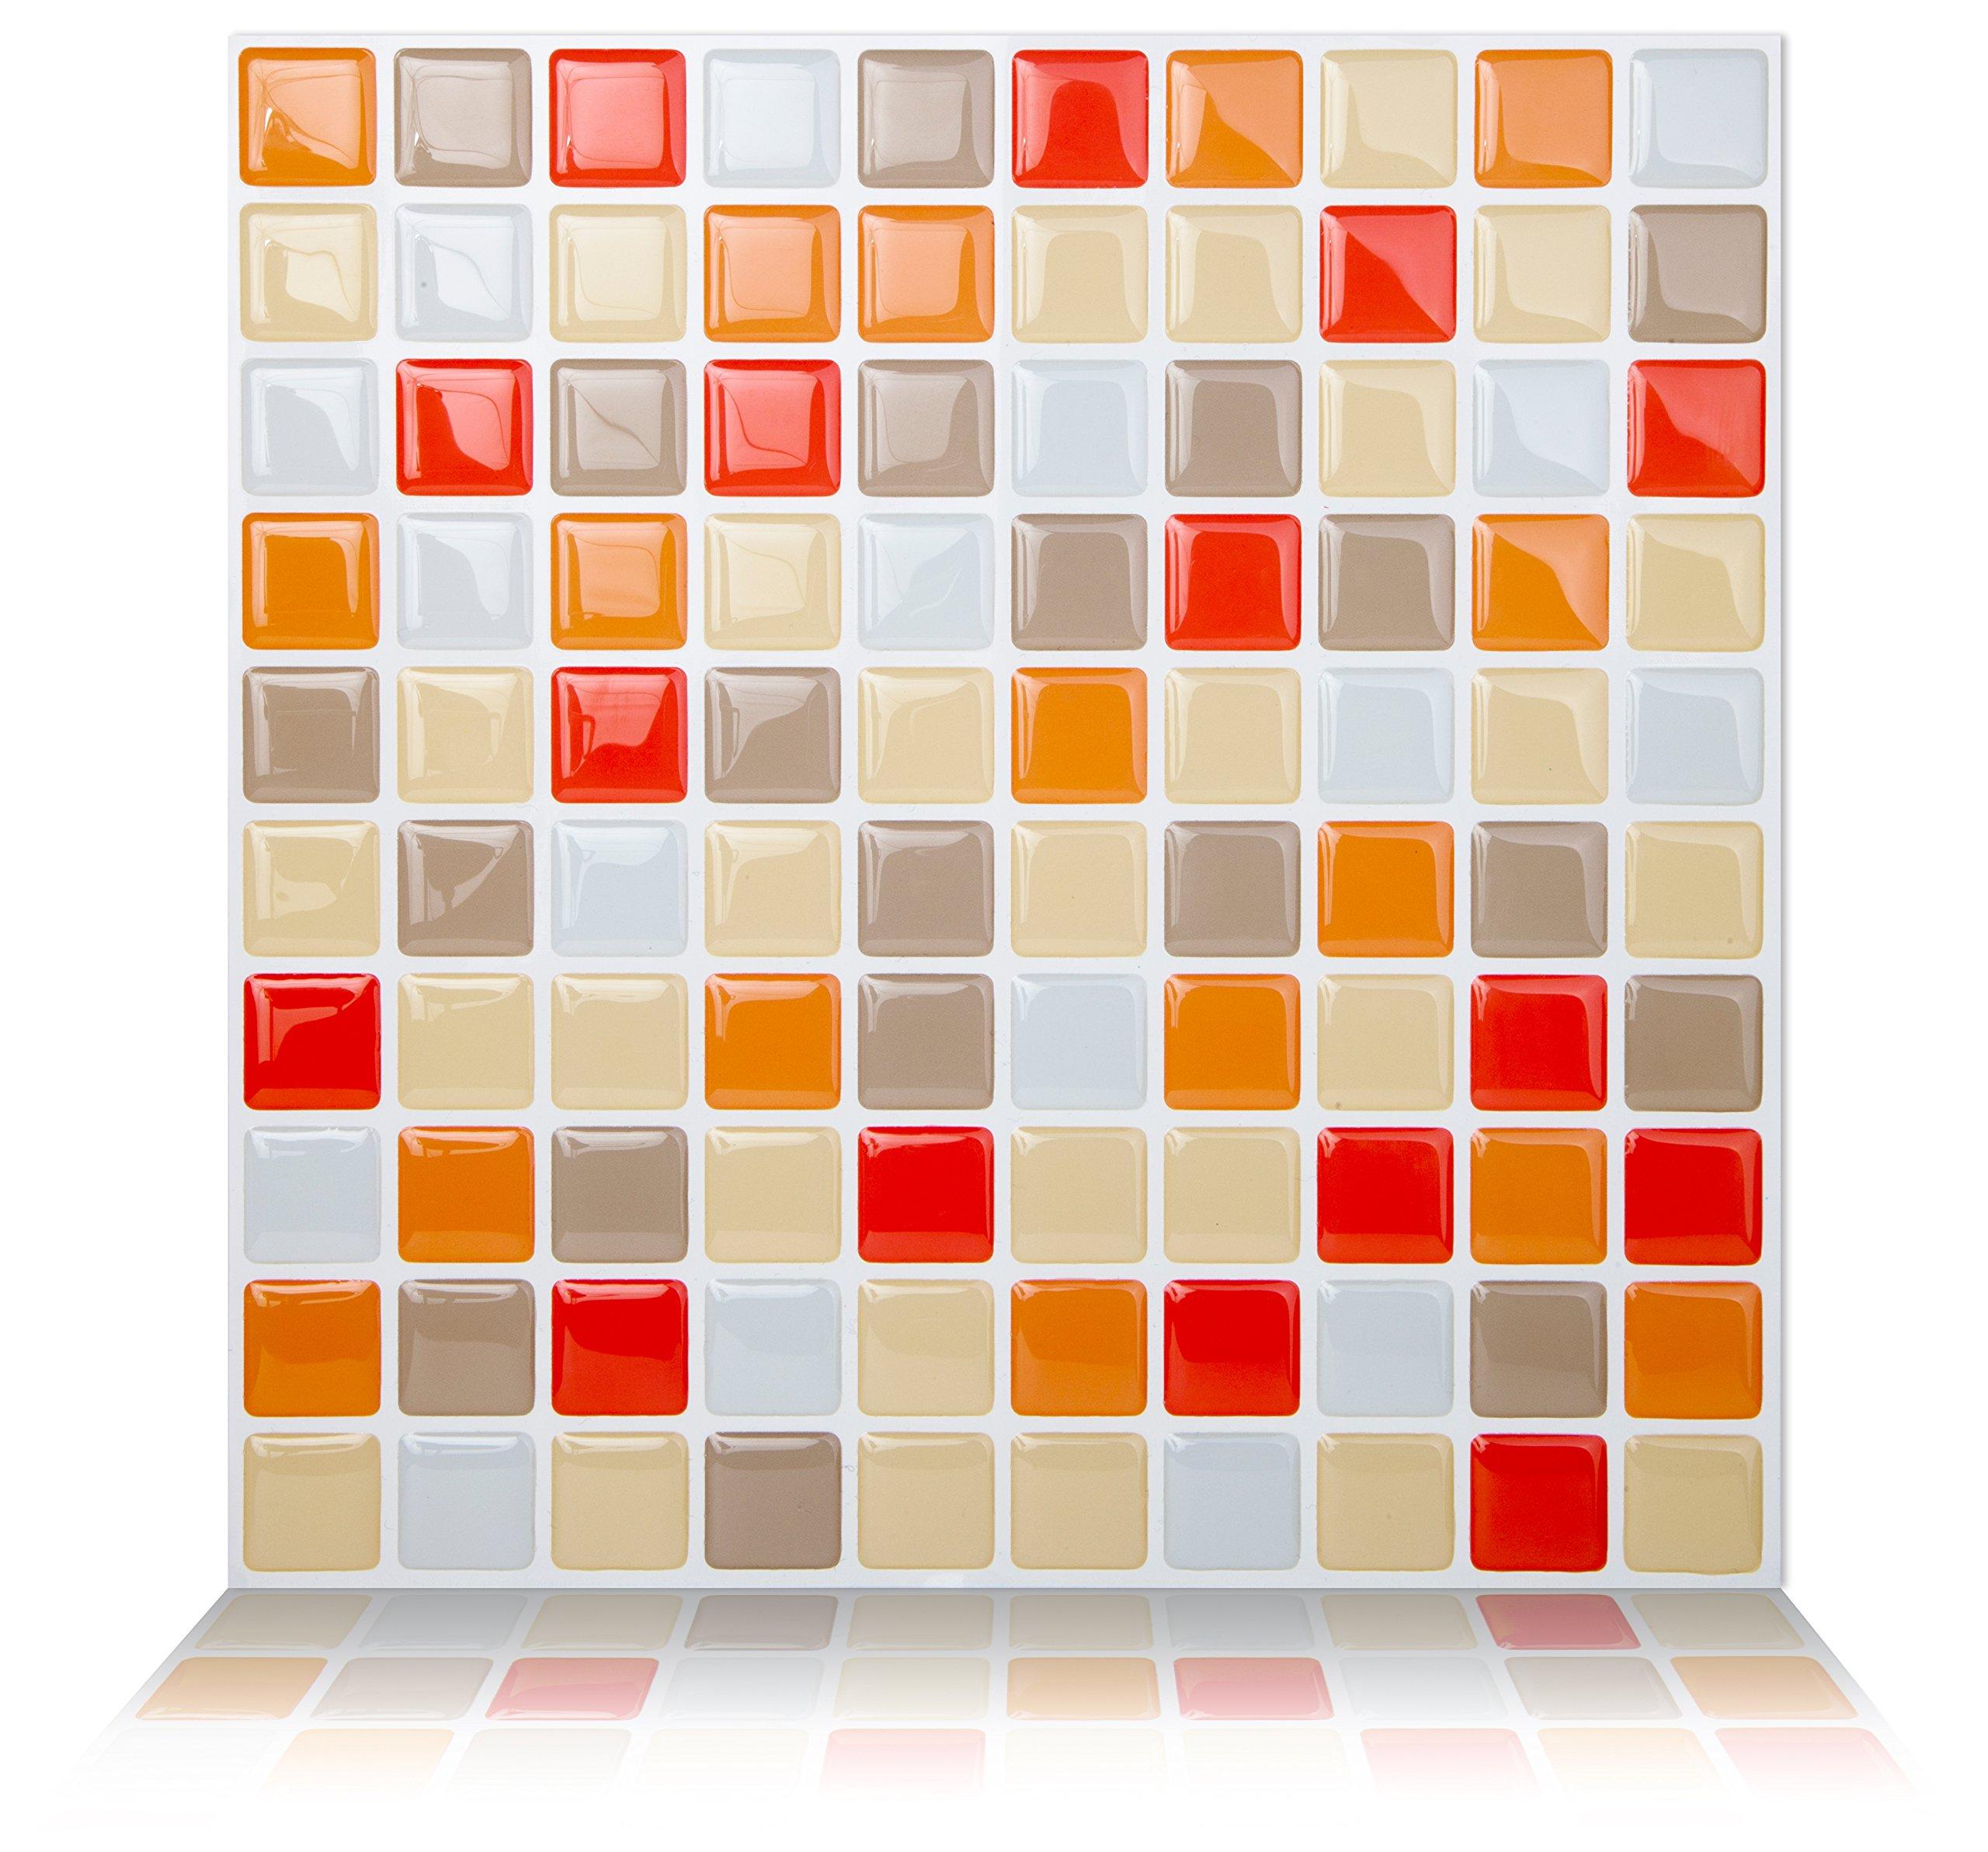 Tic Tac Tiles Peel and Stick Wall Tile in Mosaic Vanillaorange (10 tiles)